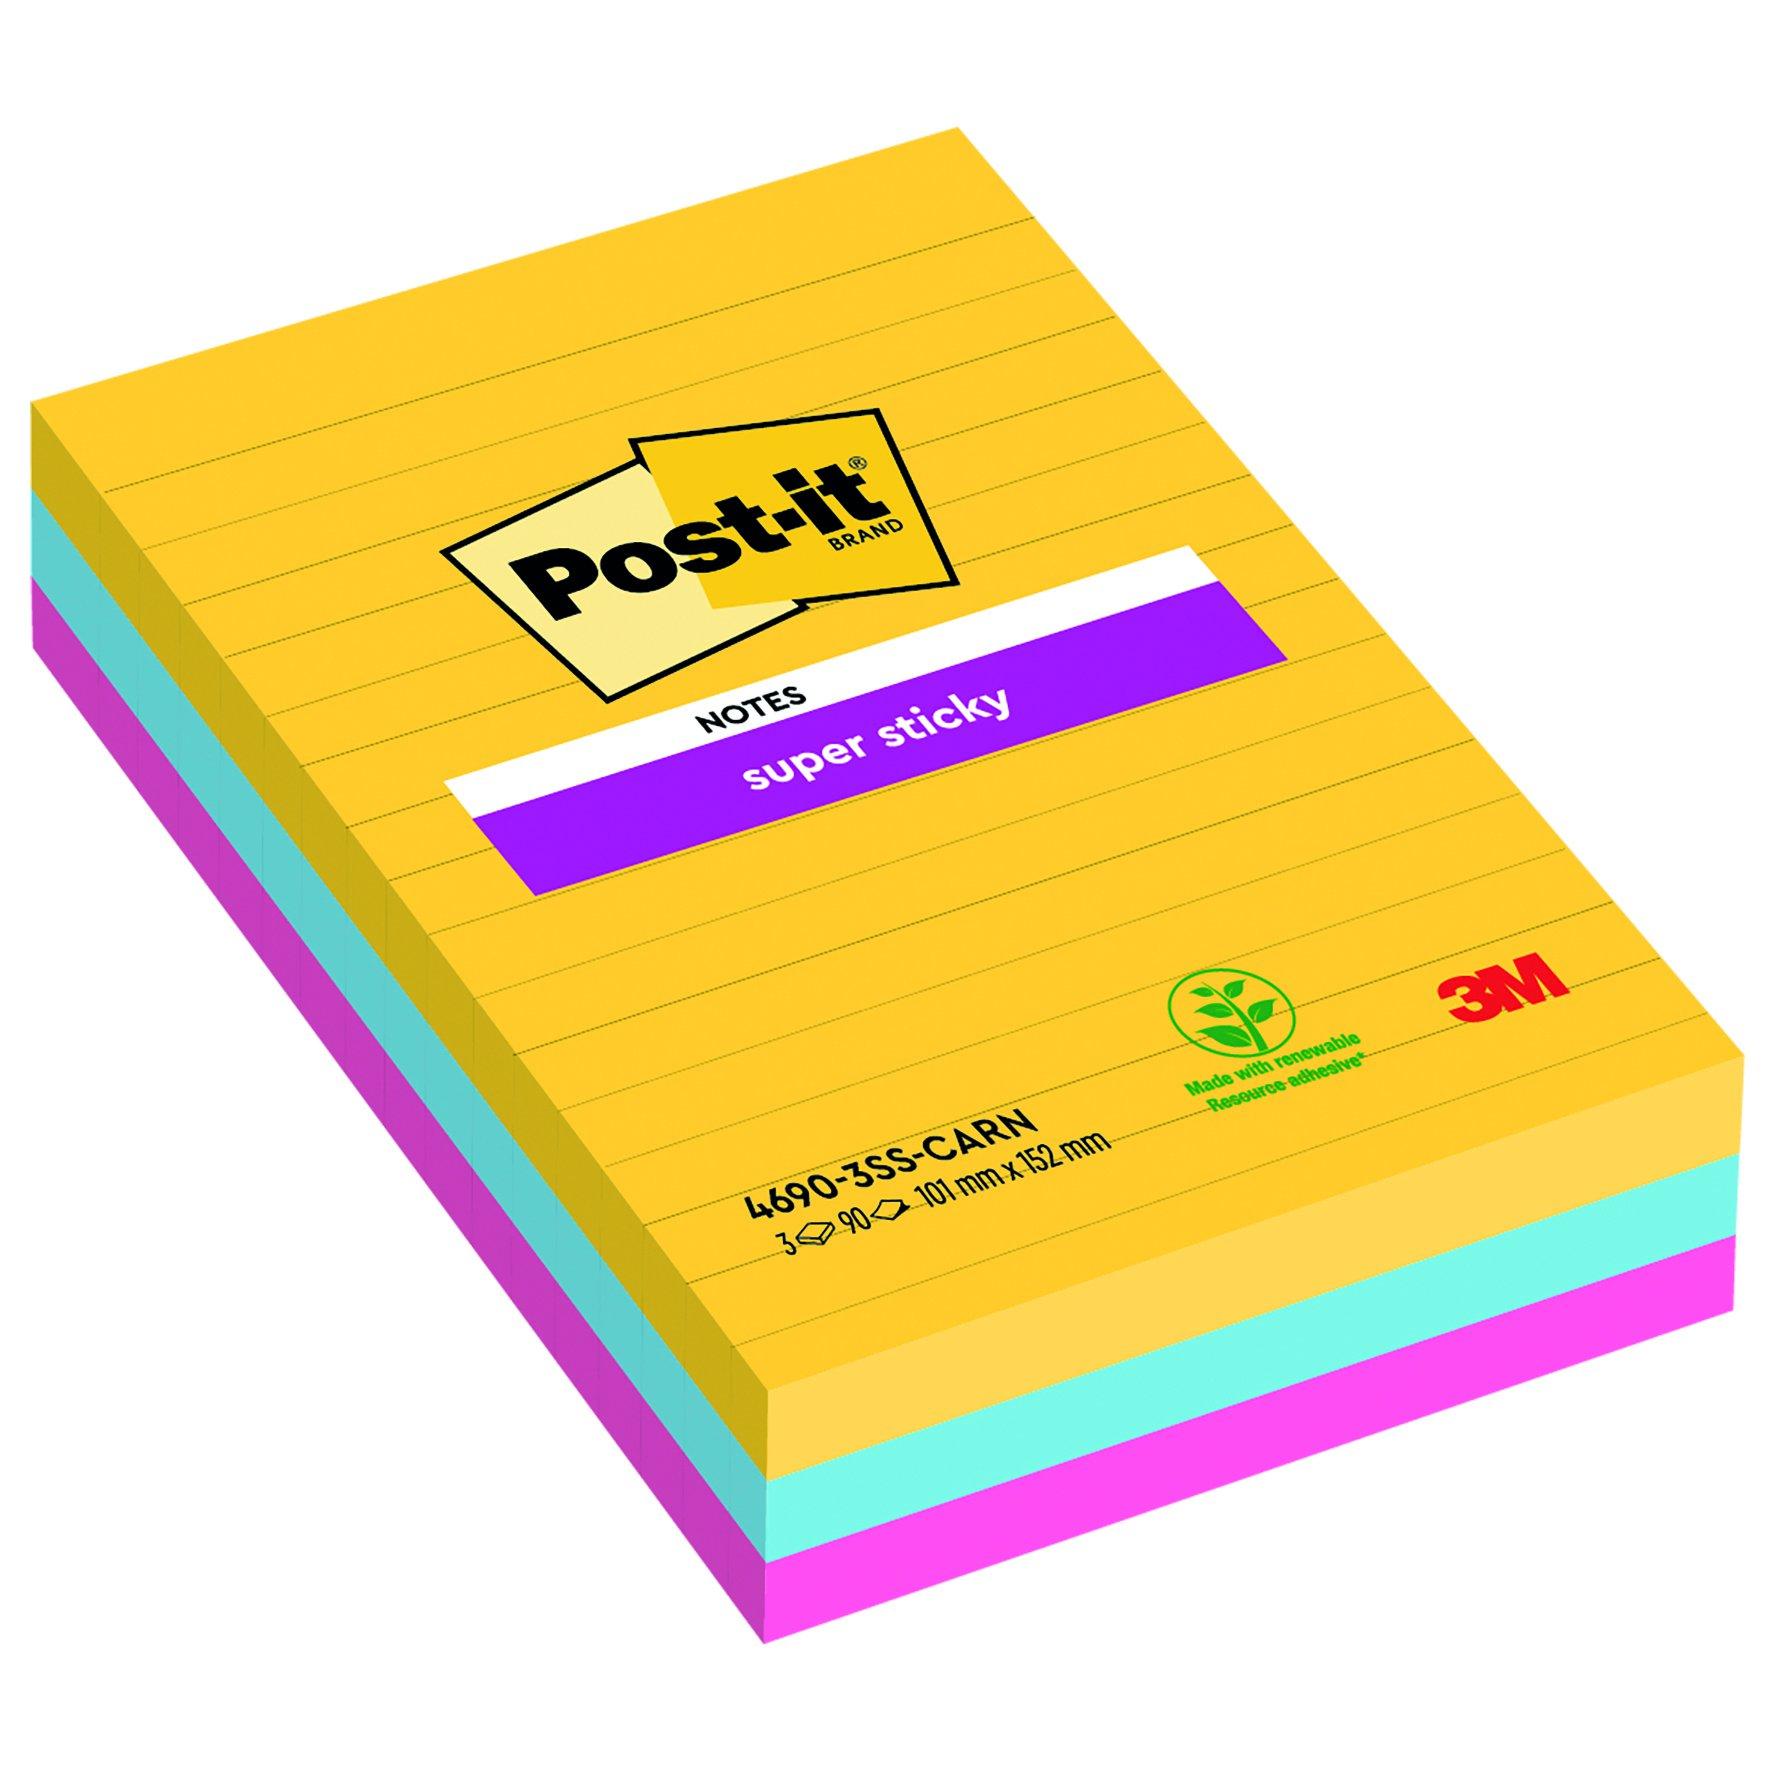 3M Post-it Super Sticky Colour Notes 101x153mm Rio (3) 4690-SS3RIO